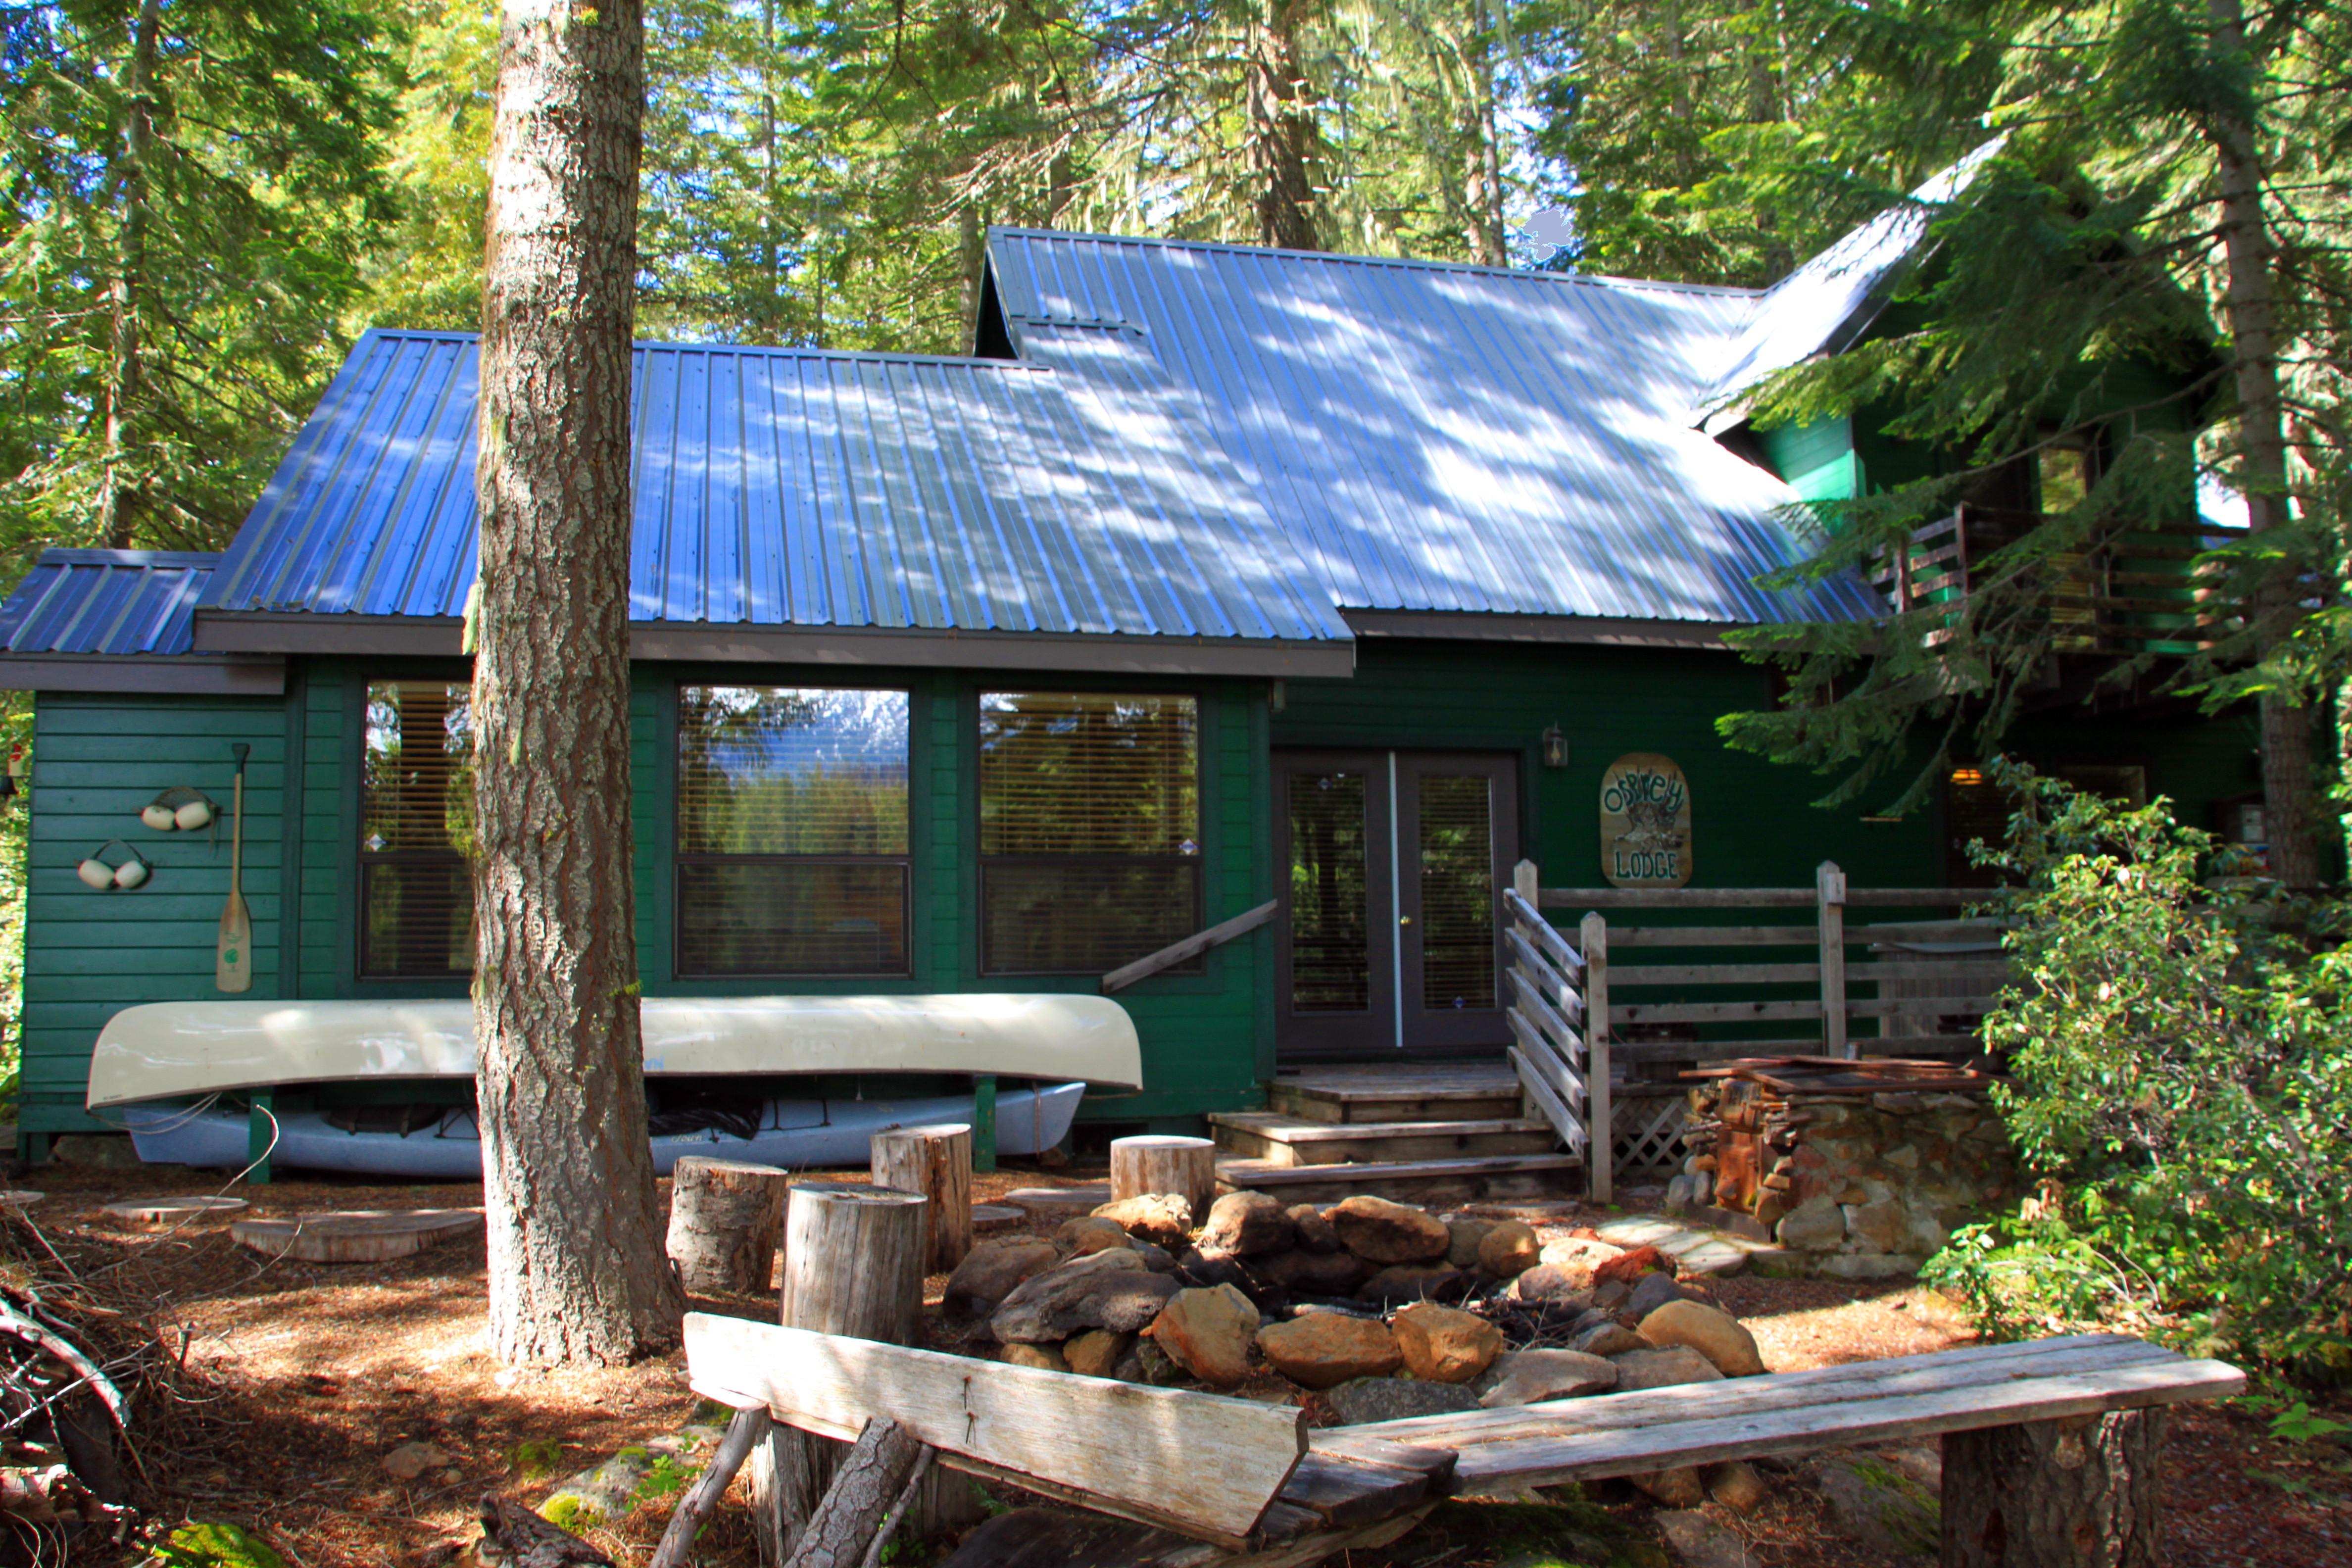 Fish lake oregon cabin for sale h4 landline real estate llc for Fish lake cabin